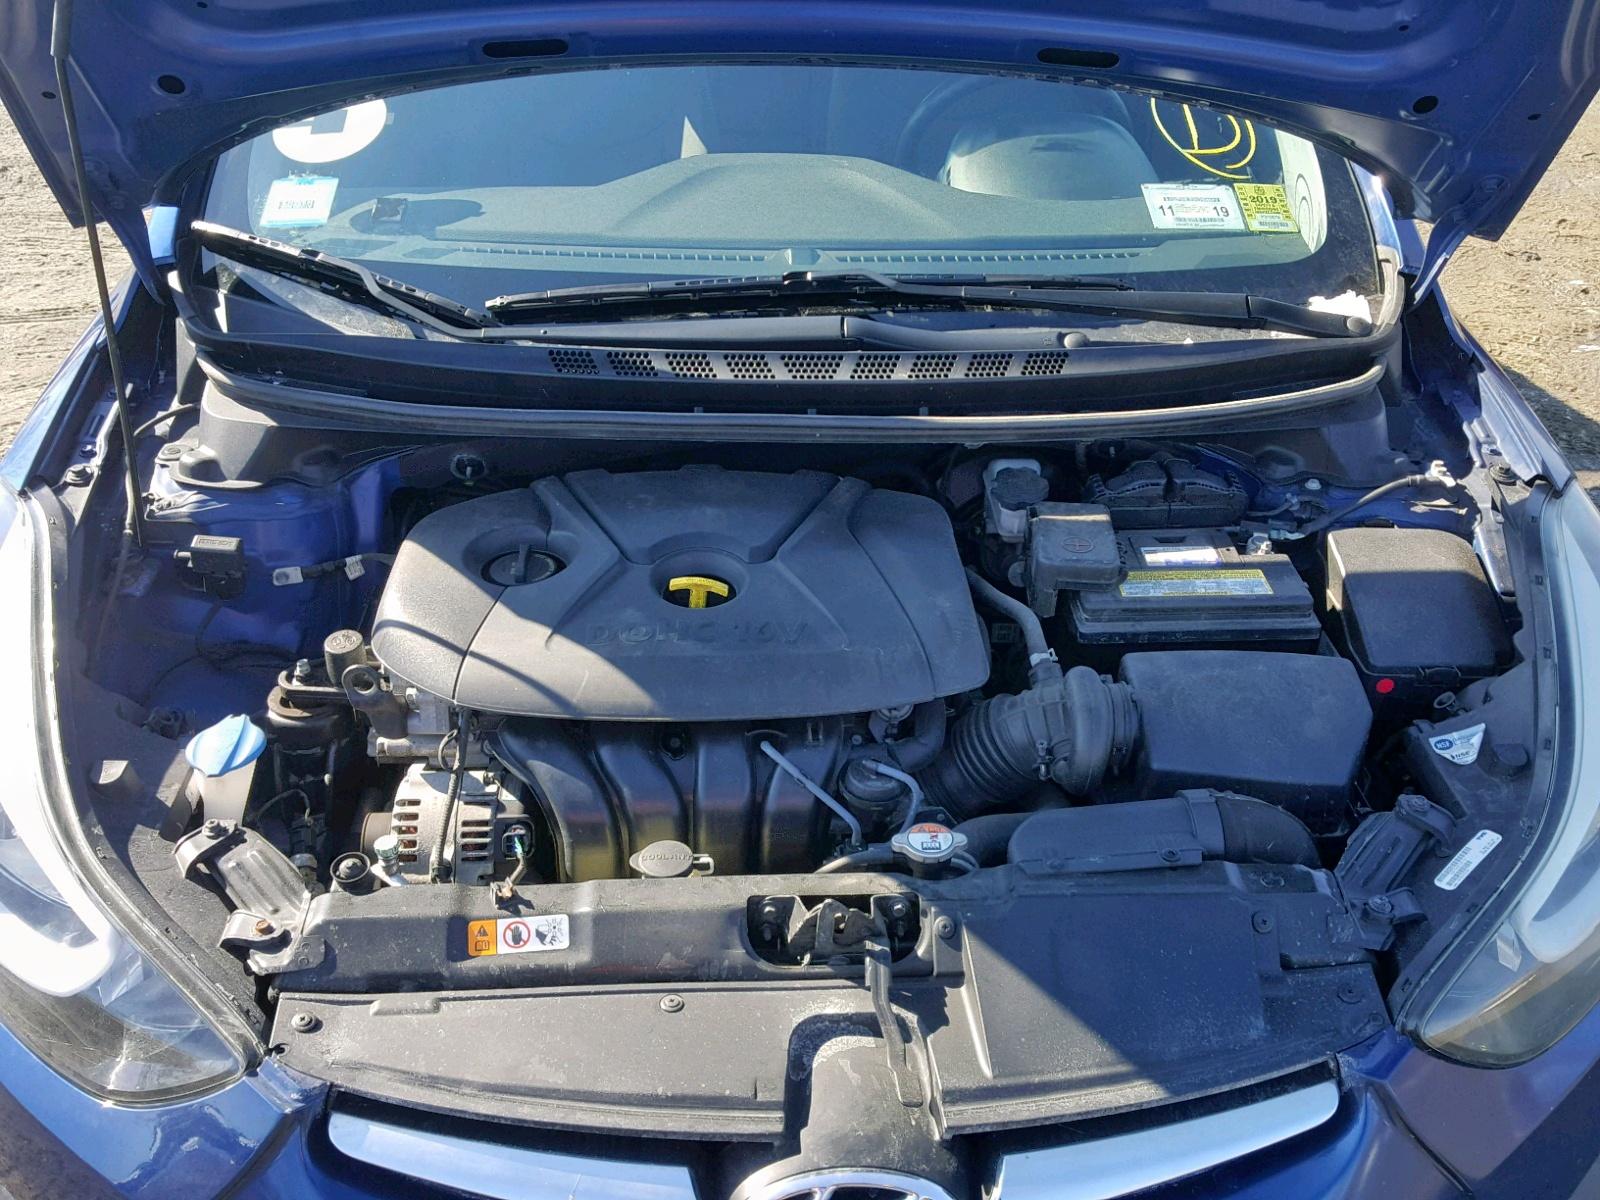 5NPDH4AE3GH740750 - 2016 Hyundai Elantra Se 1.8L inside view